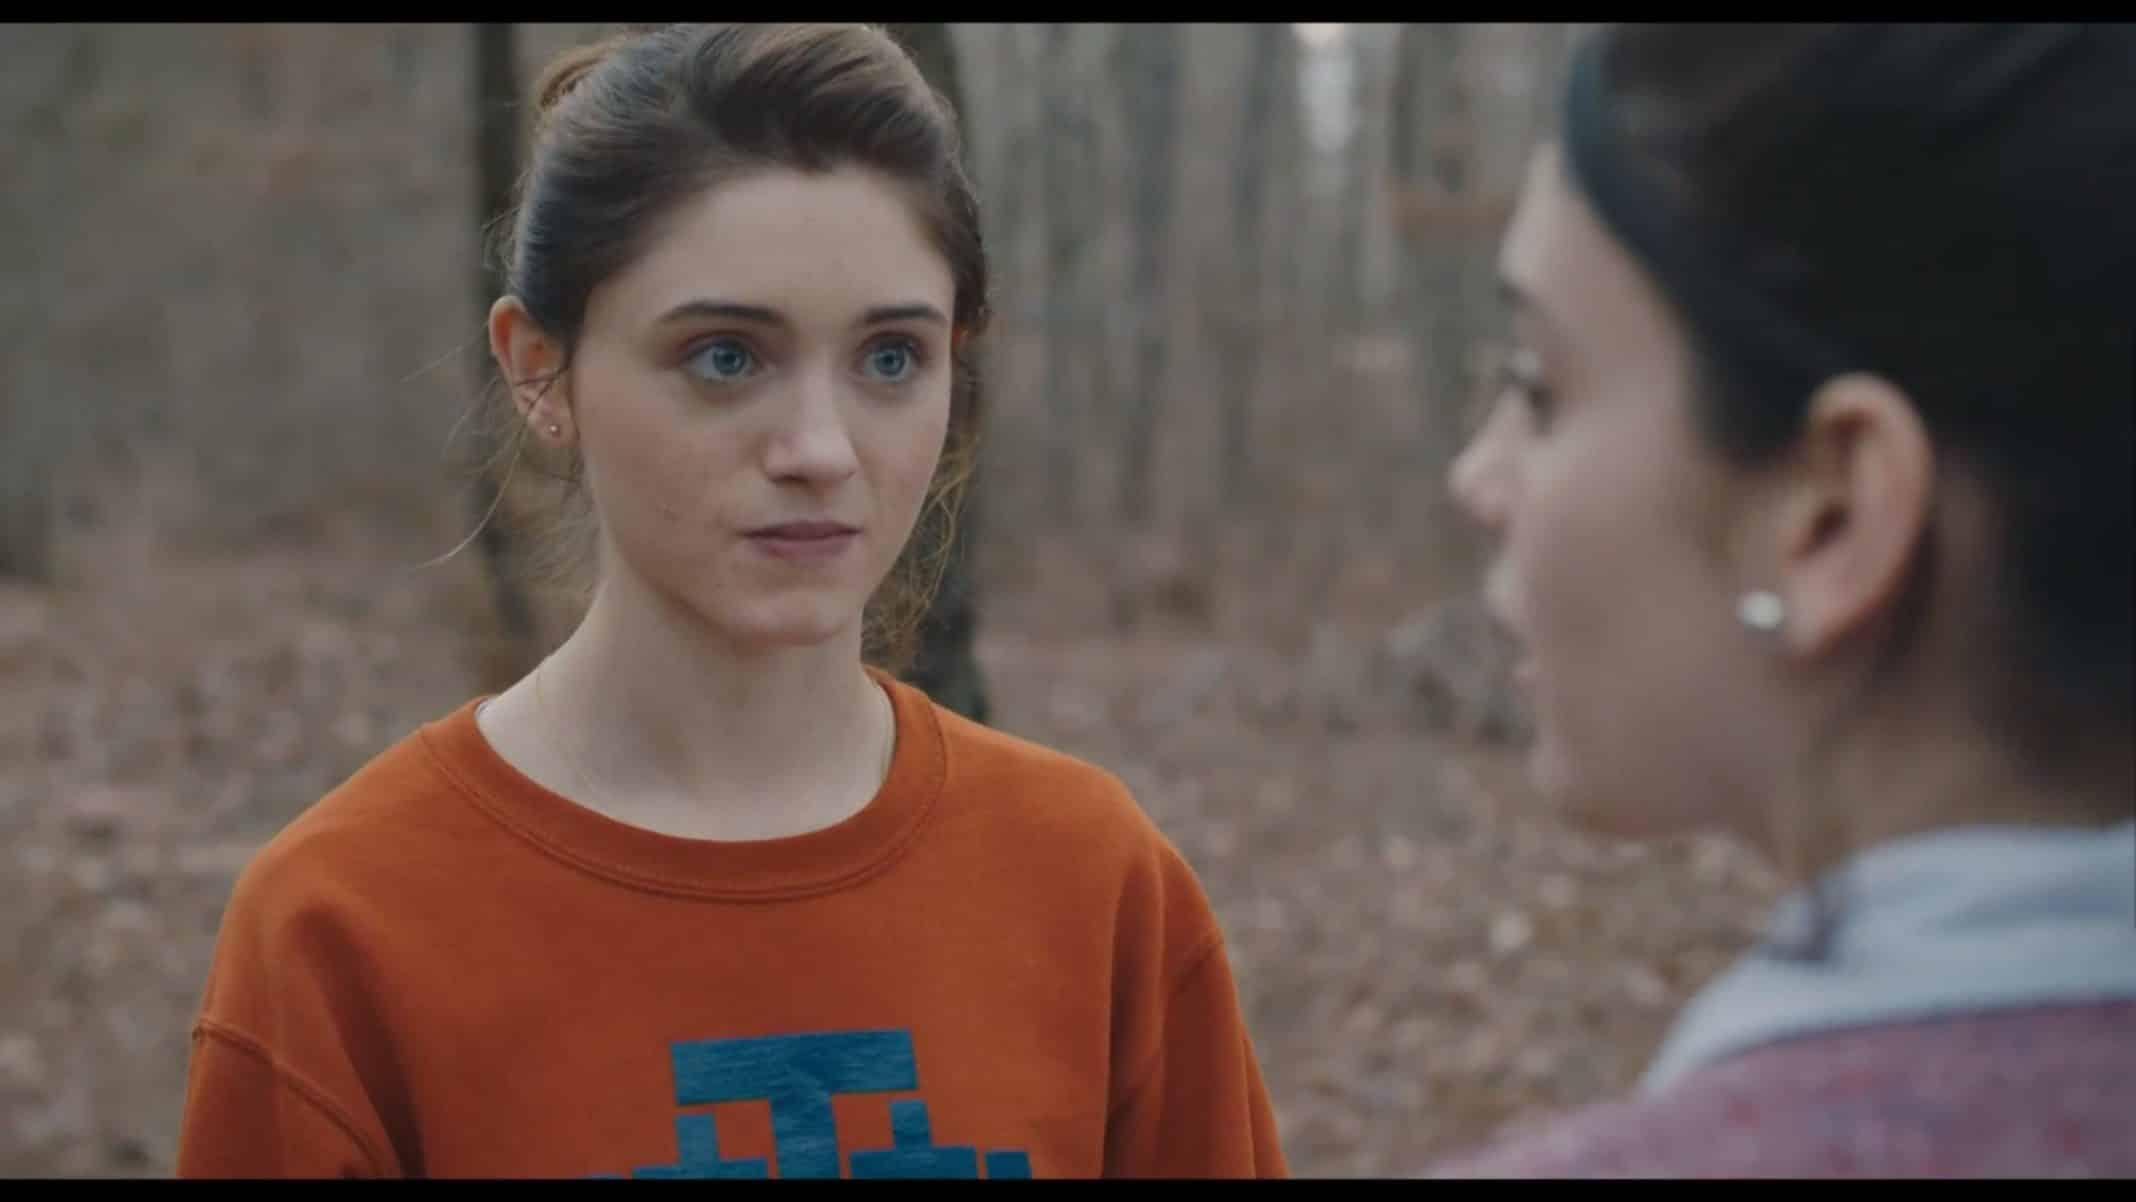 Alice (Natalia Dyer) talking to her friend.